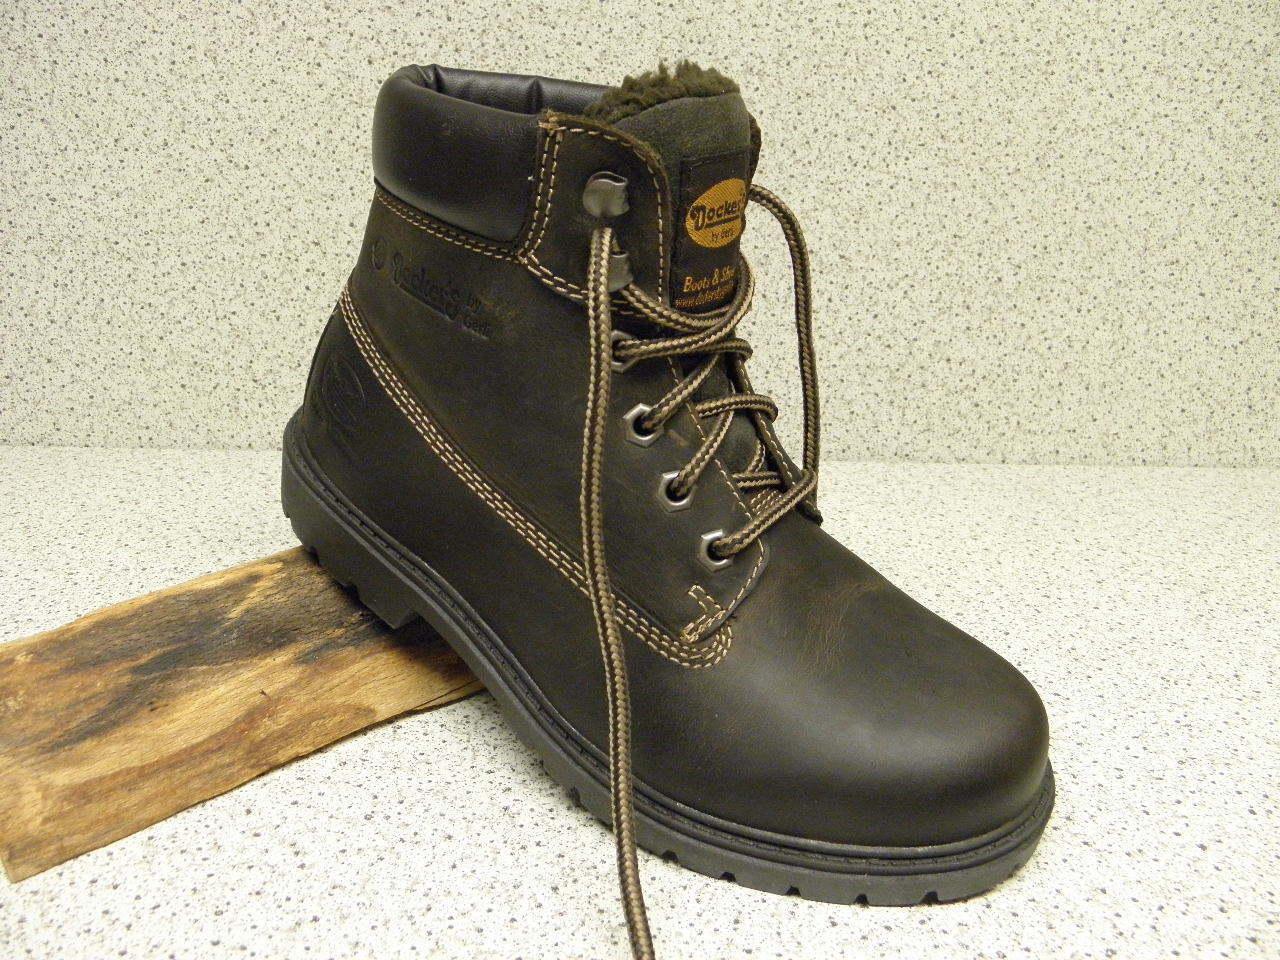 Dockers ®  SALE  braun Leder   + gratis Premium - Socken (A912)